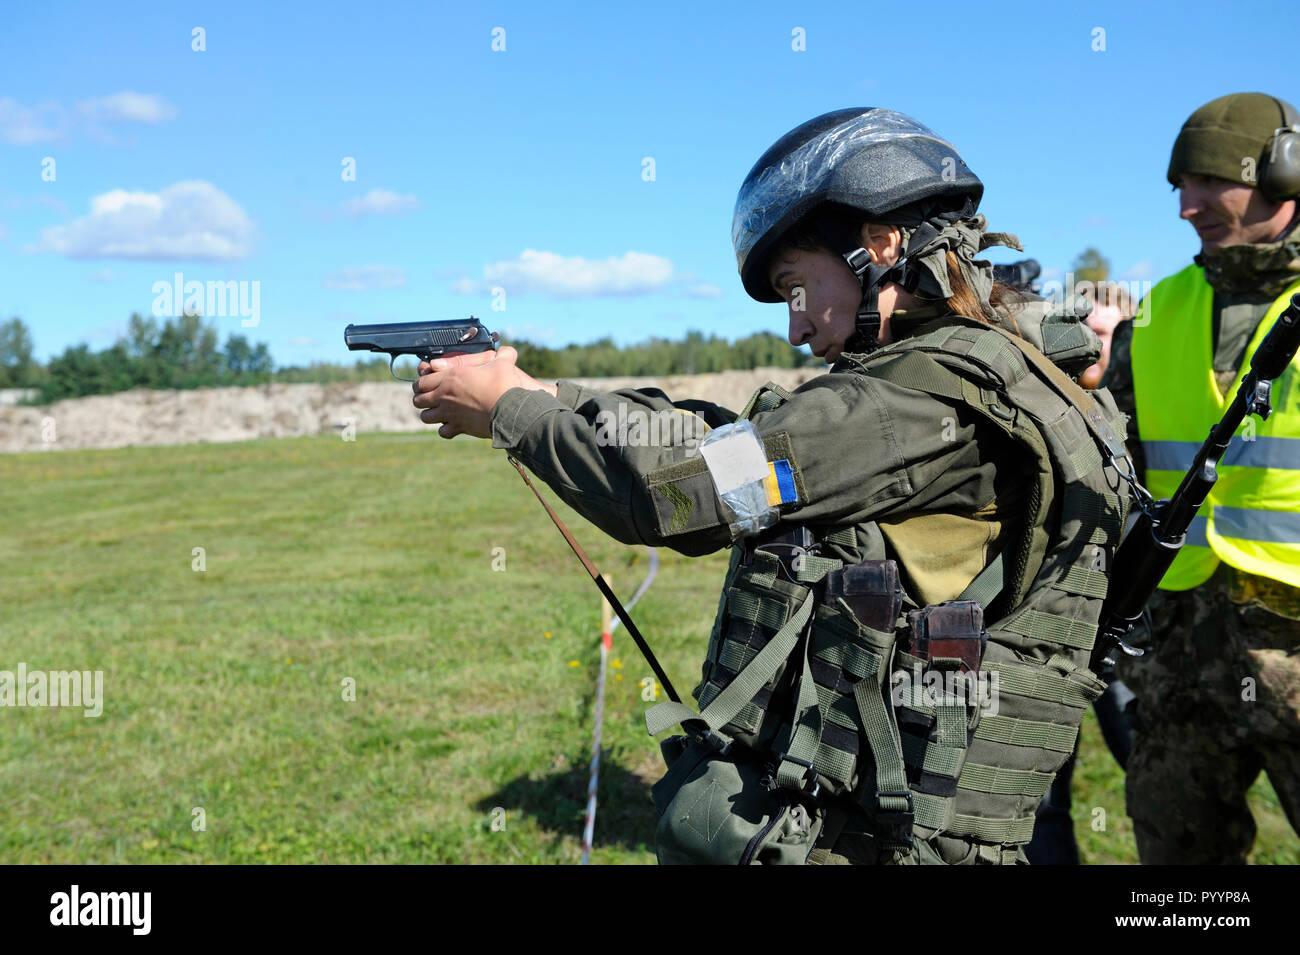 On a military shooting range, training: Ukrainian soldier machine gun firing. October 18, 2018. Novo-Petrivtsi military base, Ukraine - Stock Image